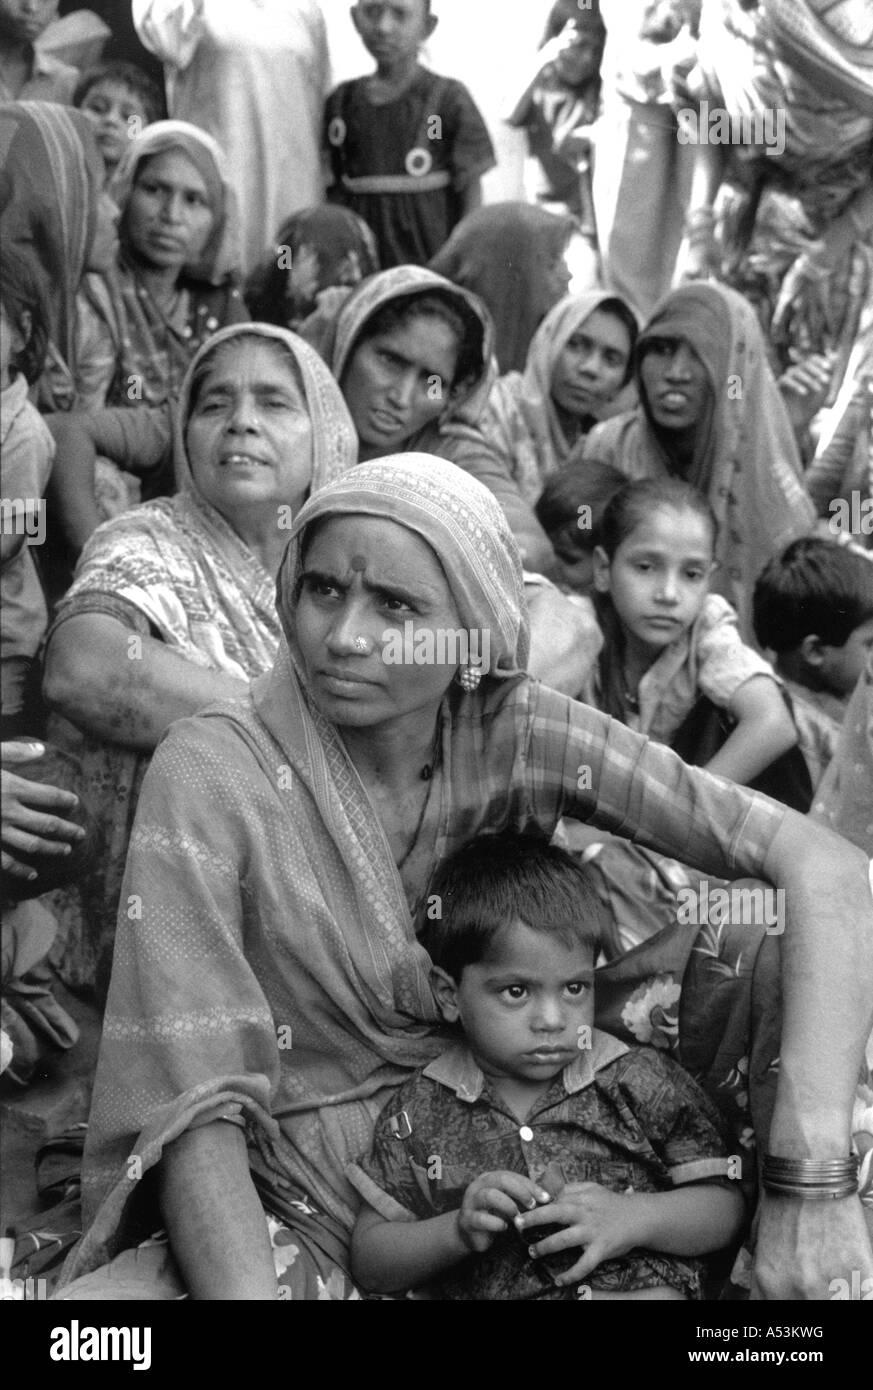 Painet ha1321 121 black and white women woman development meeting slum ahmedabad gujarat india country developing - Stock Image